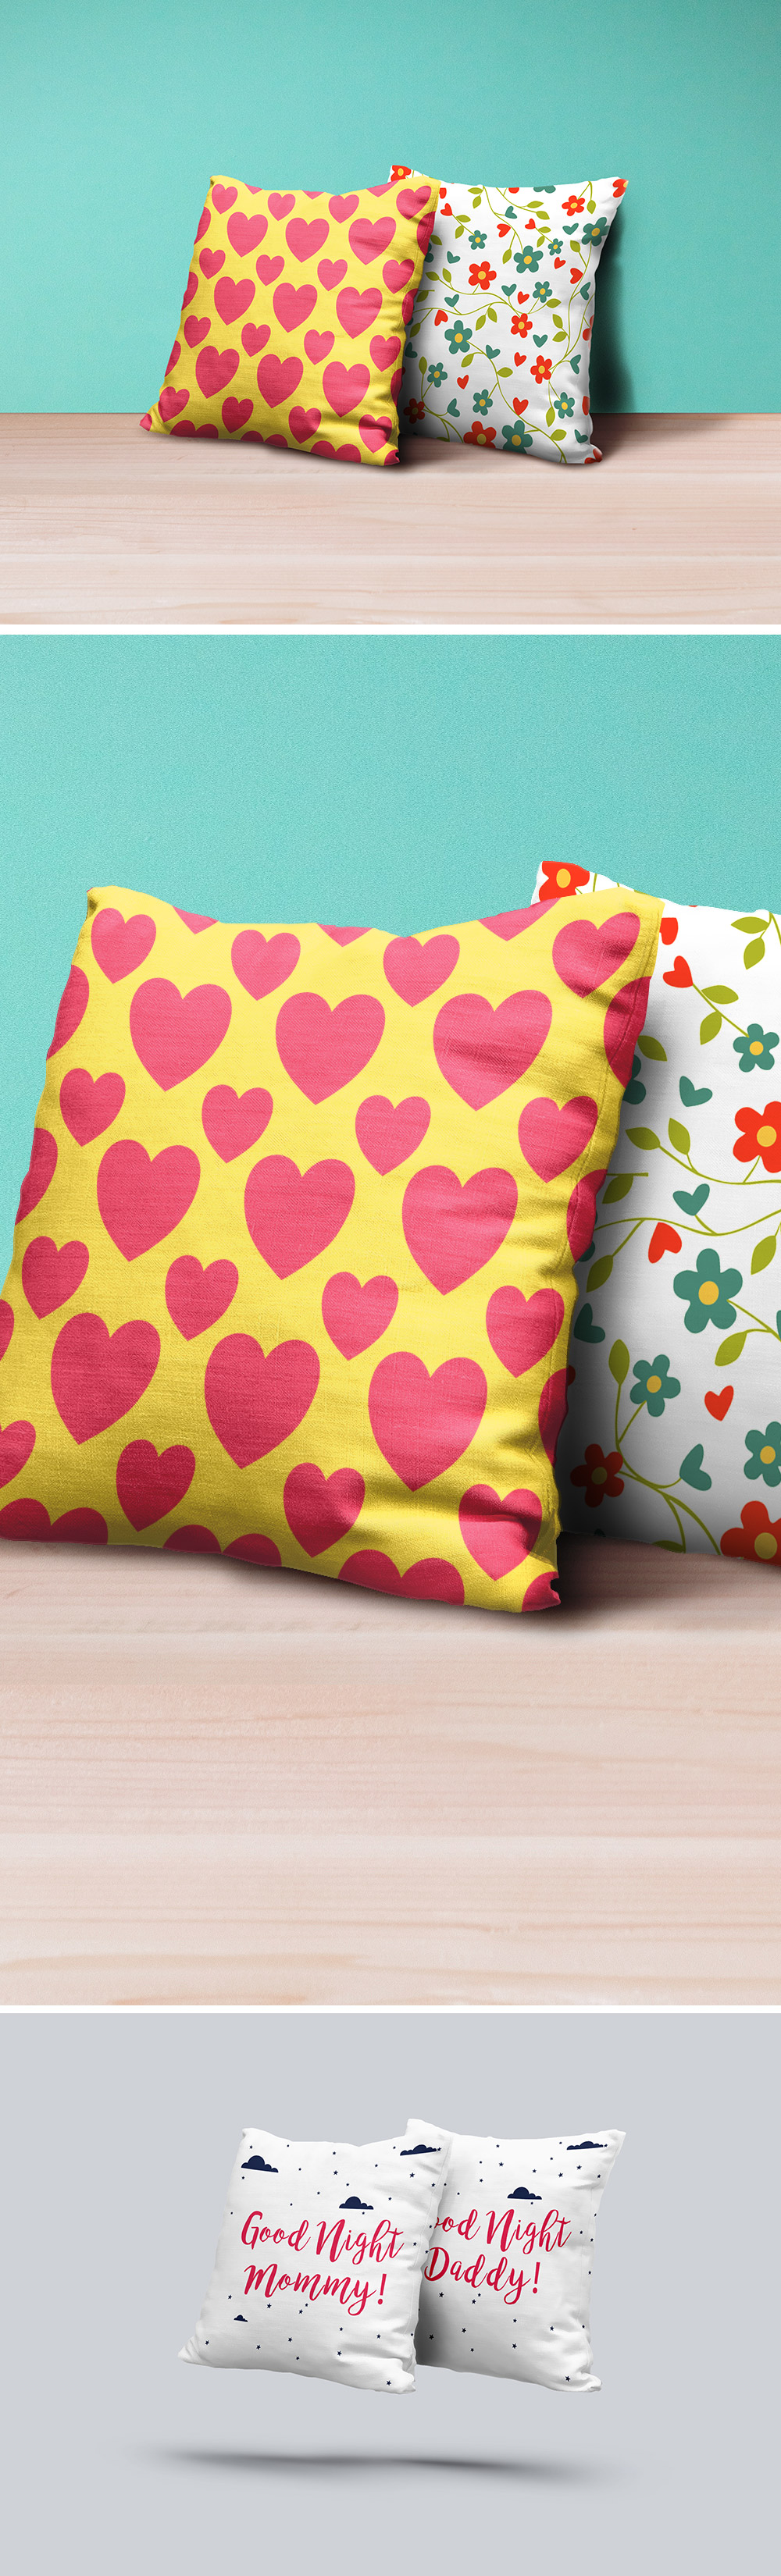 Square Pillows Mockup PSD